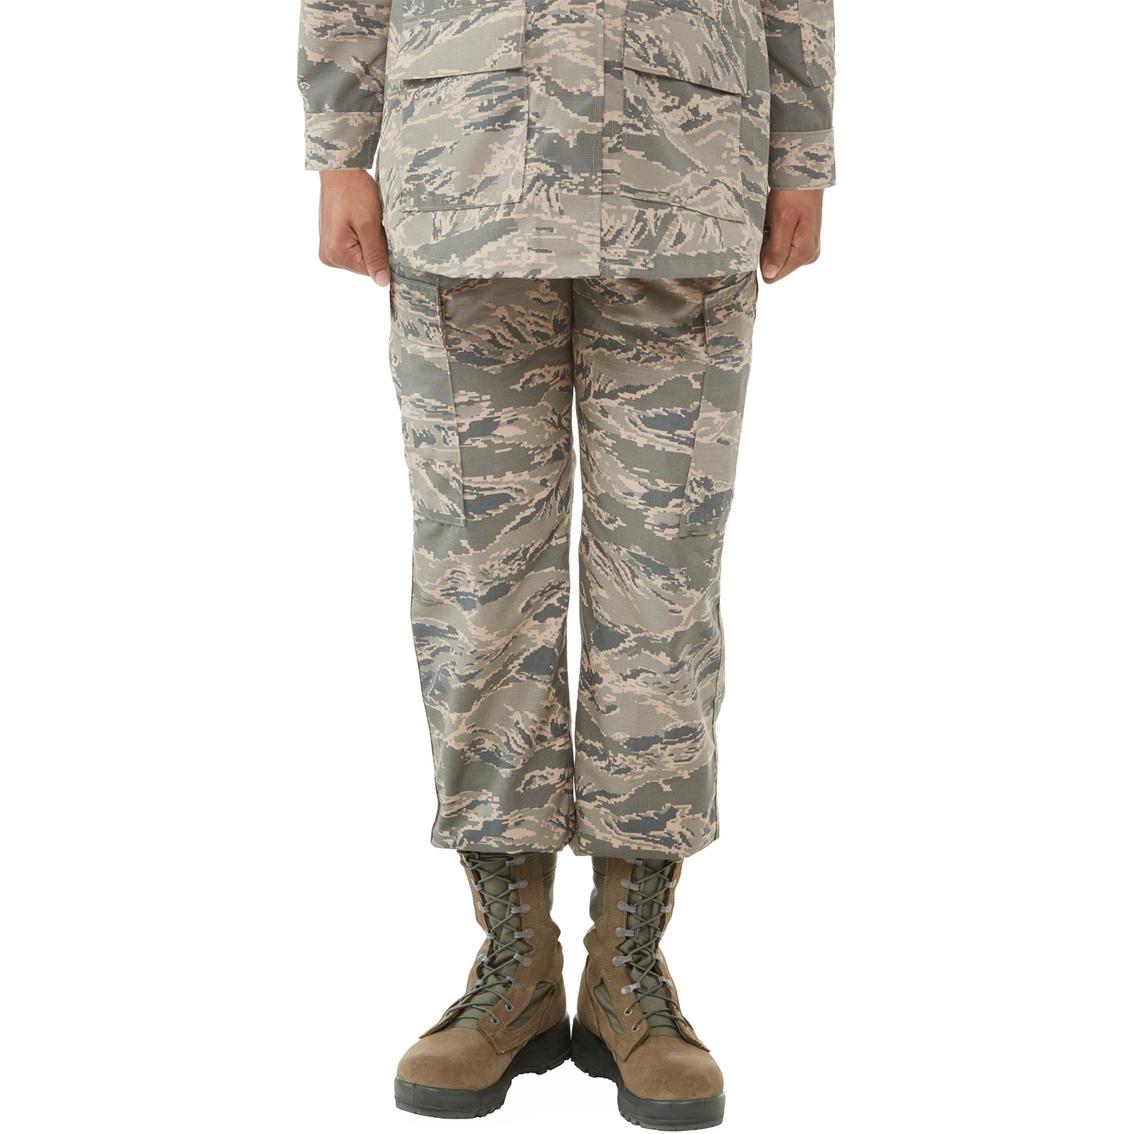 6e266546f74b5 Dlats Air Force Maternity Airman Battle Uniform (mabu) Slacks ...